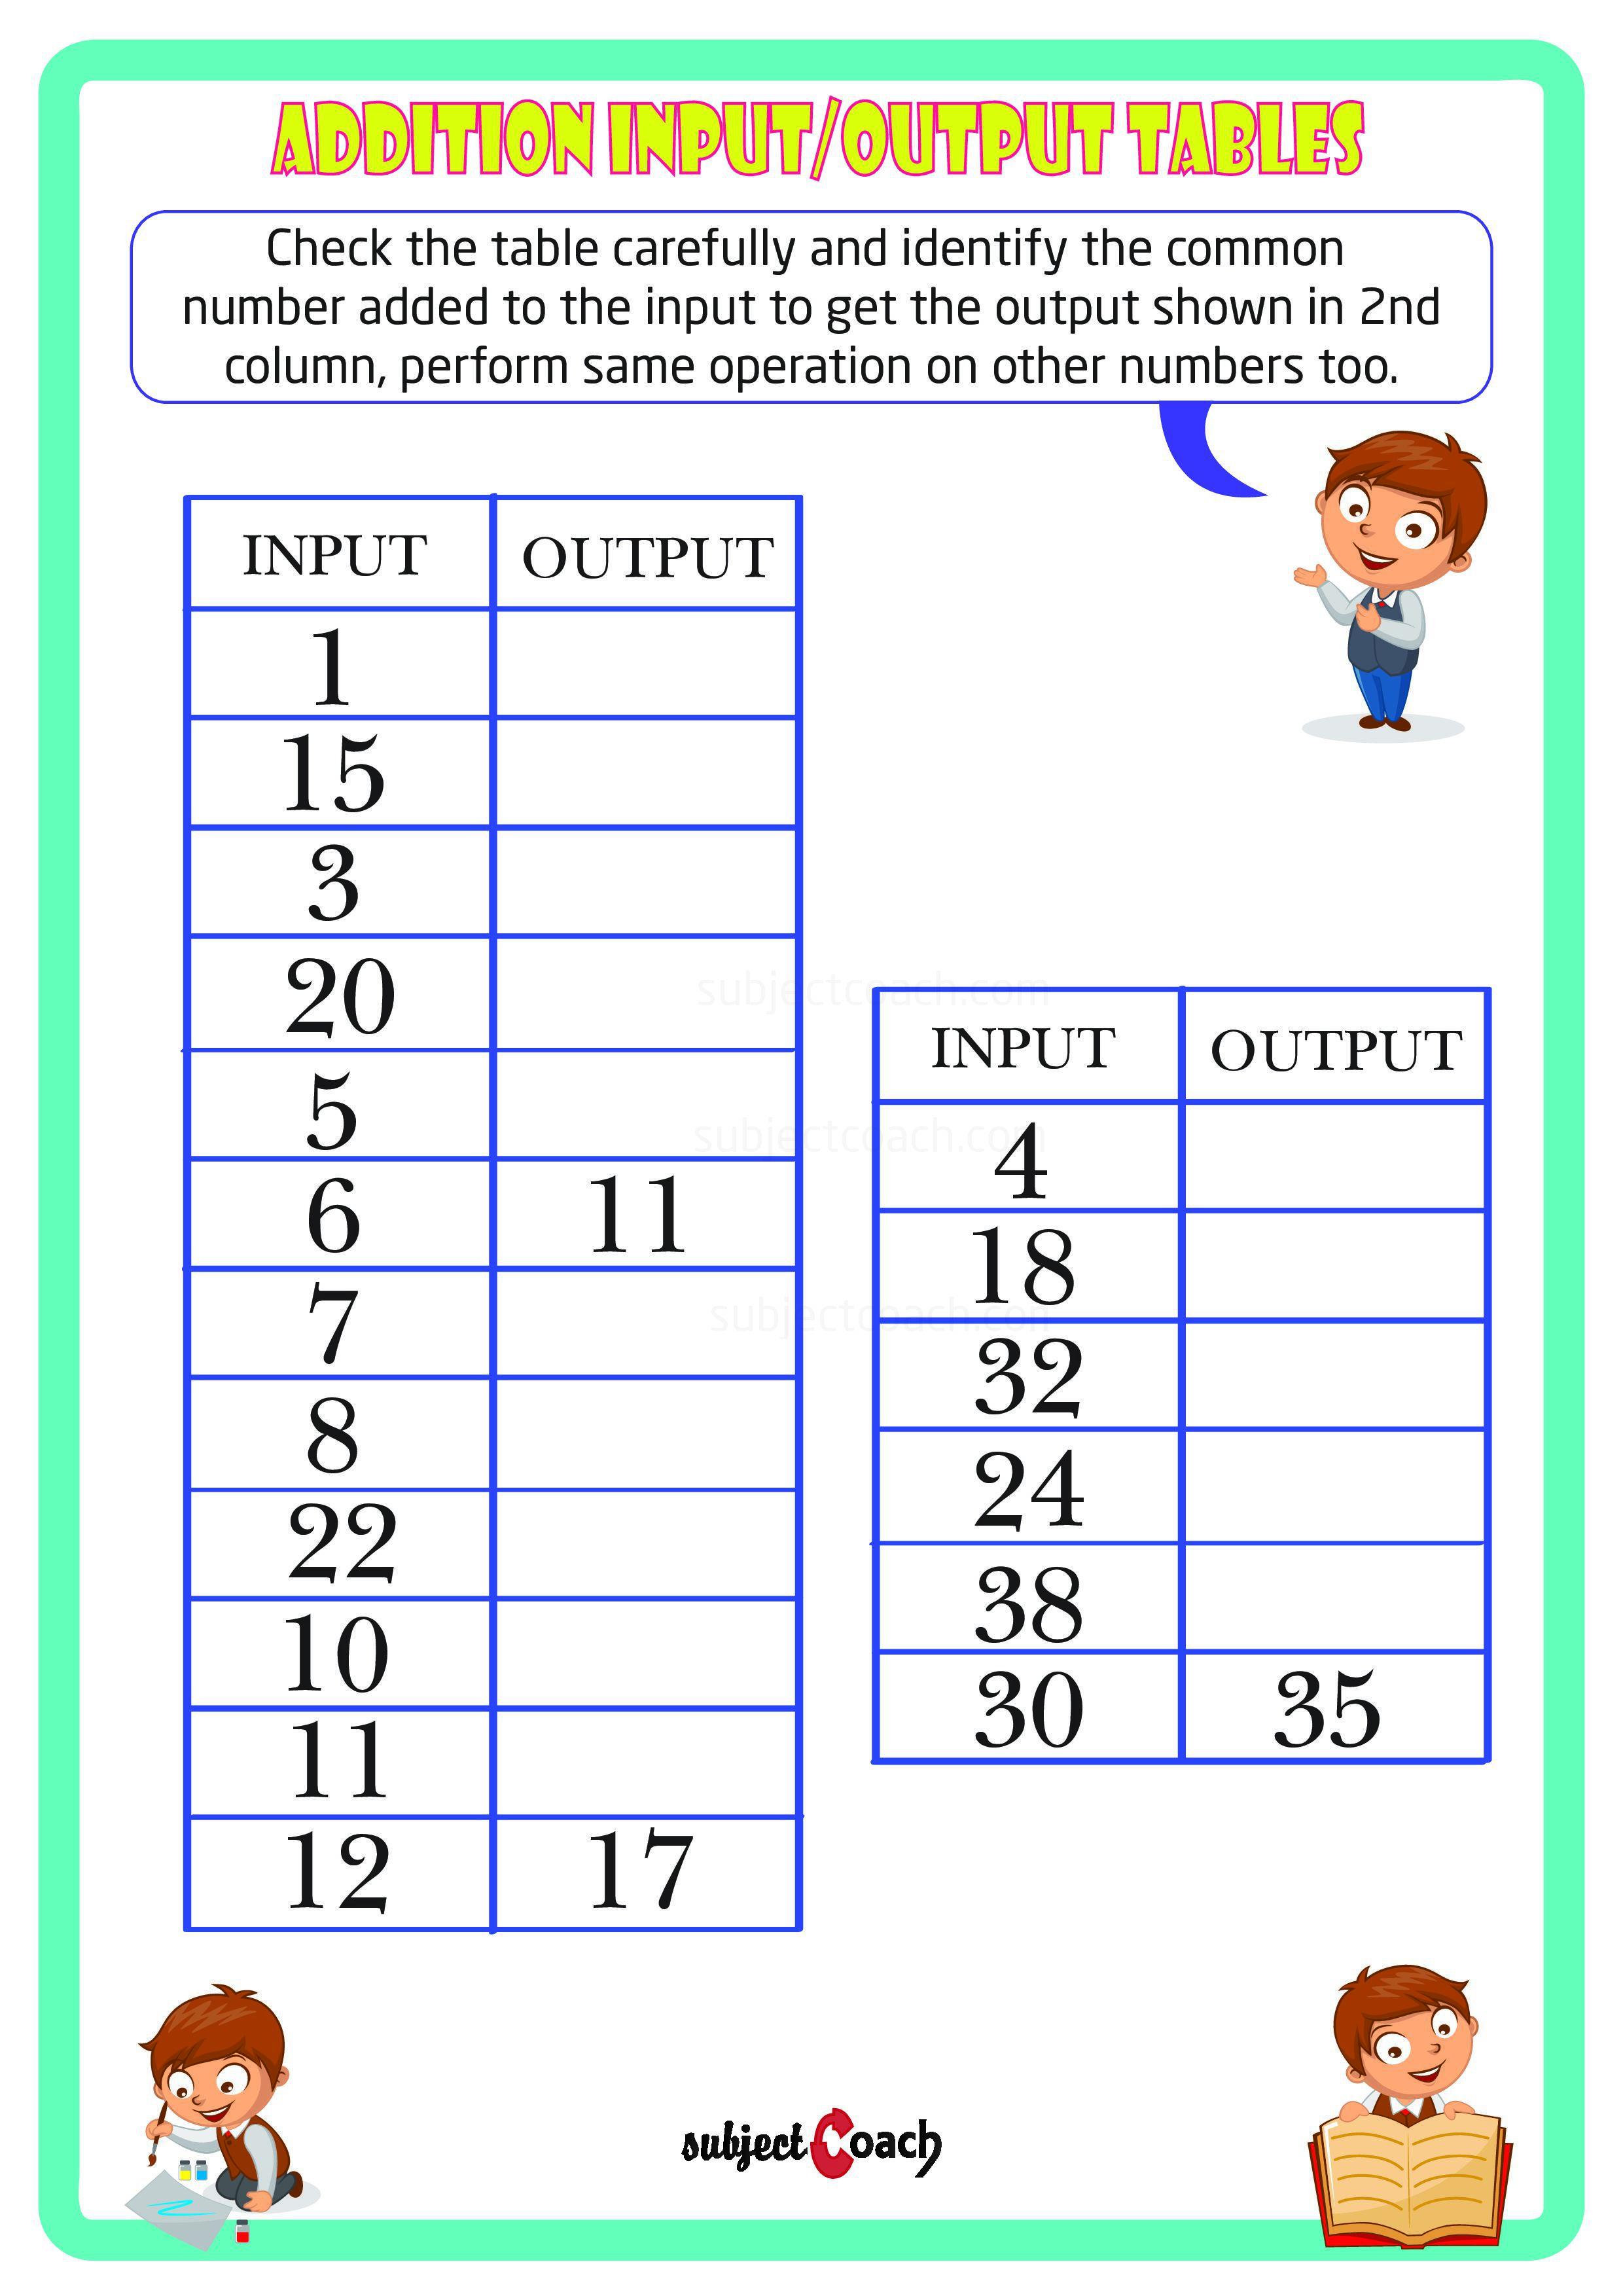 Addition Input Output tables. Problem 1.